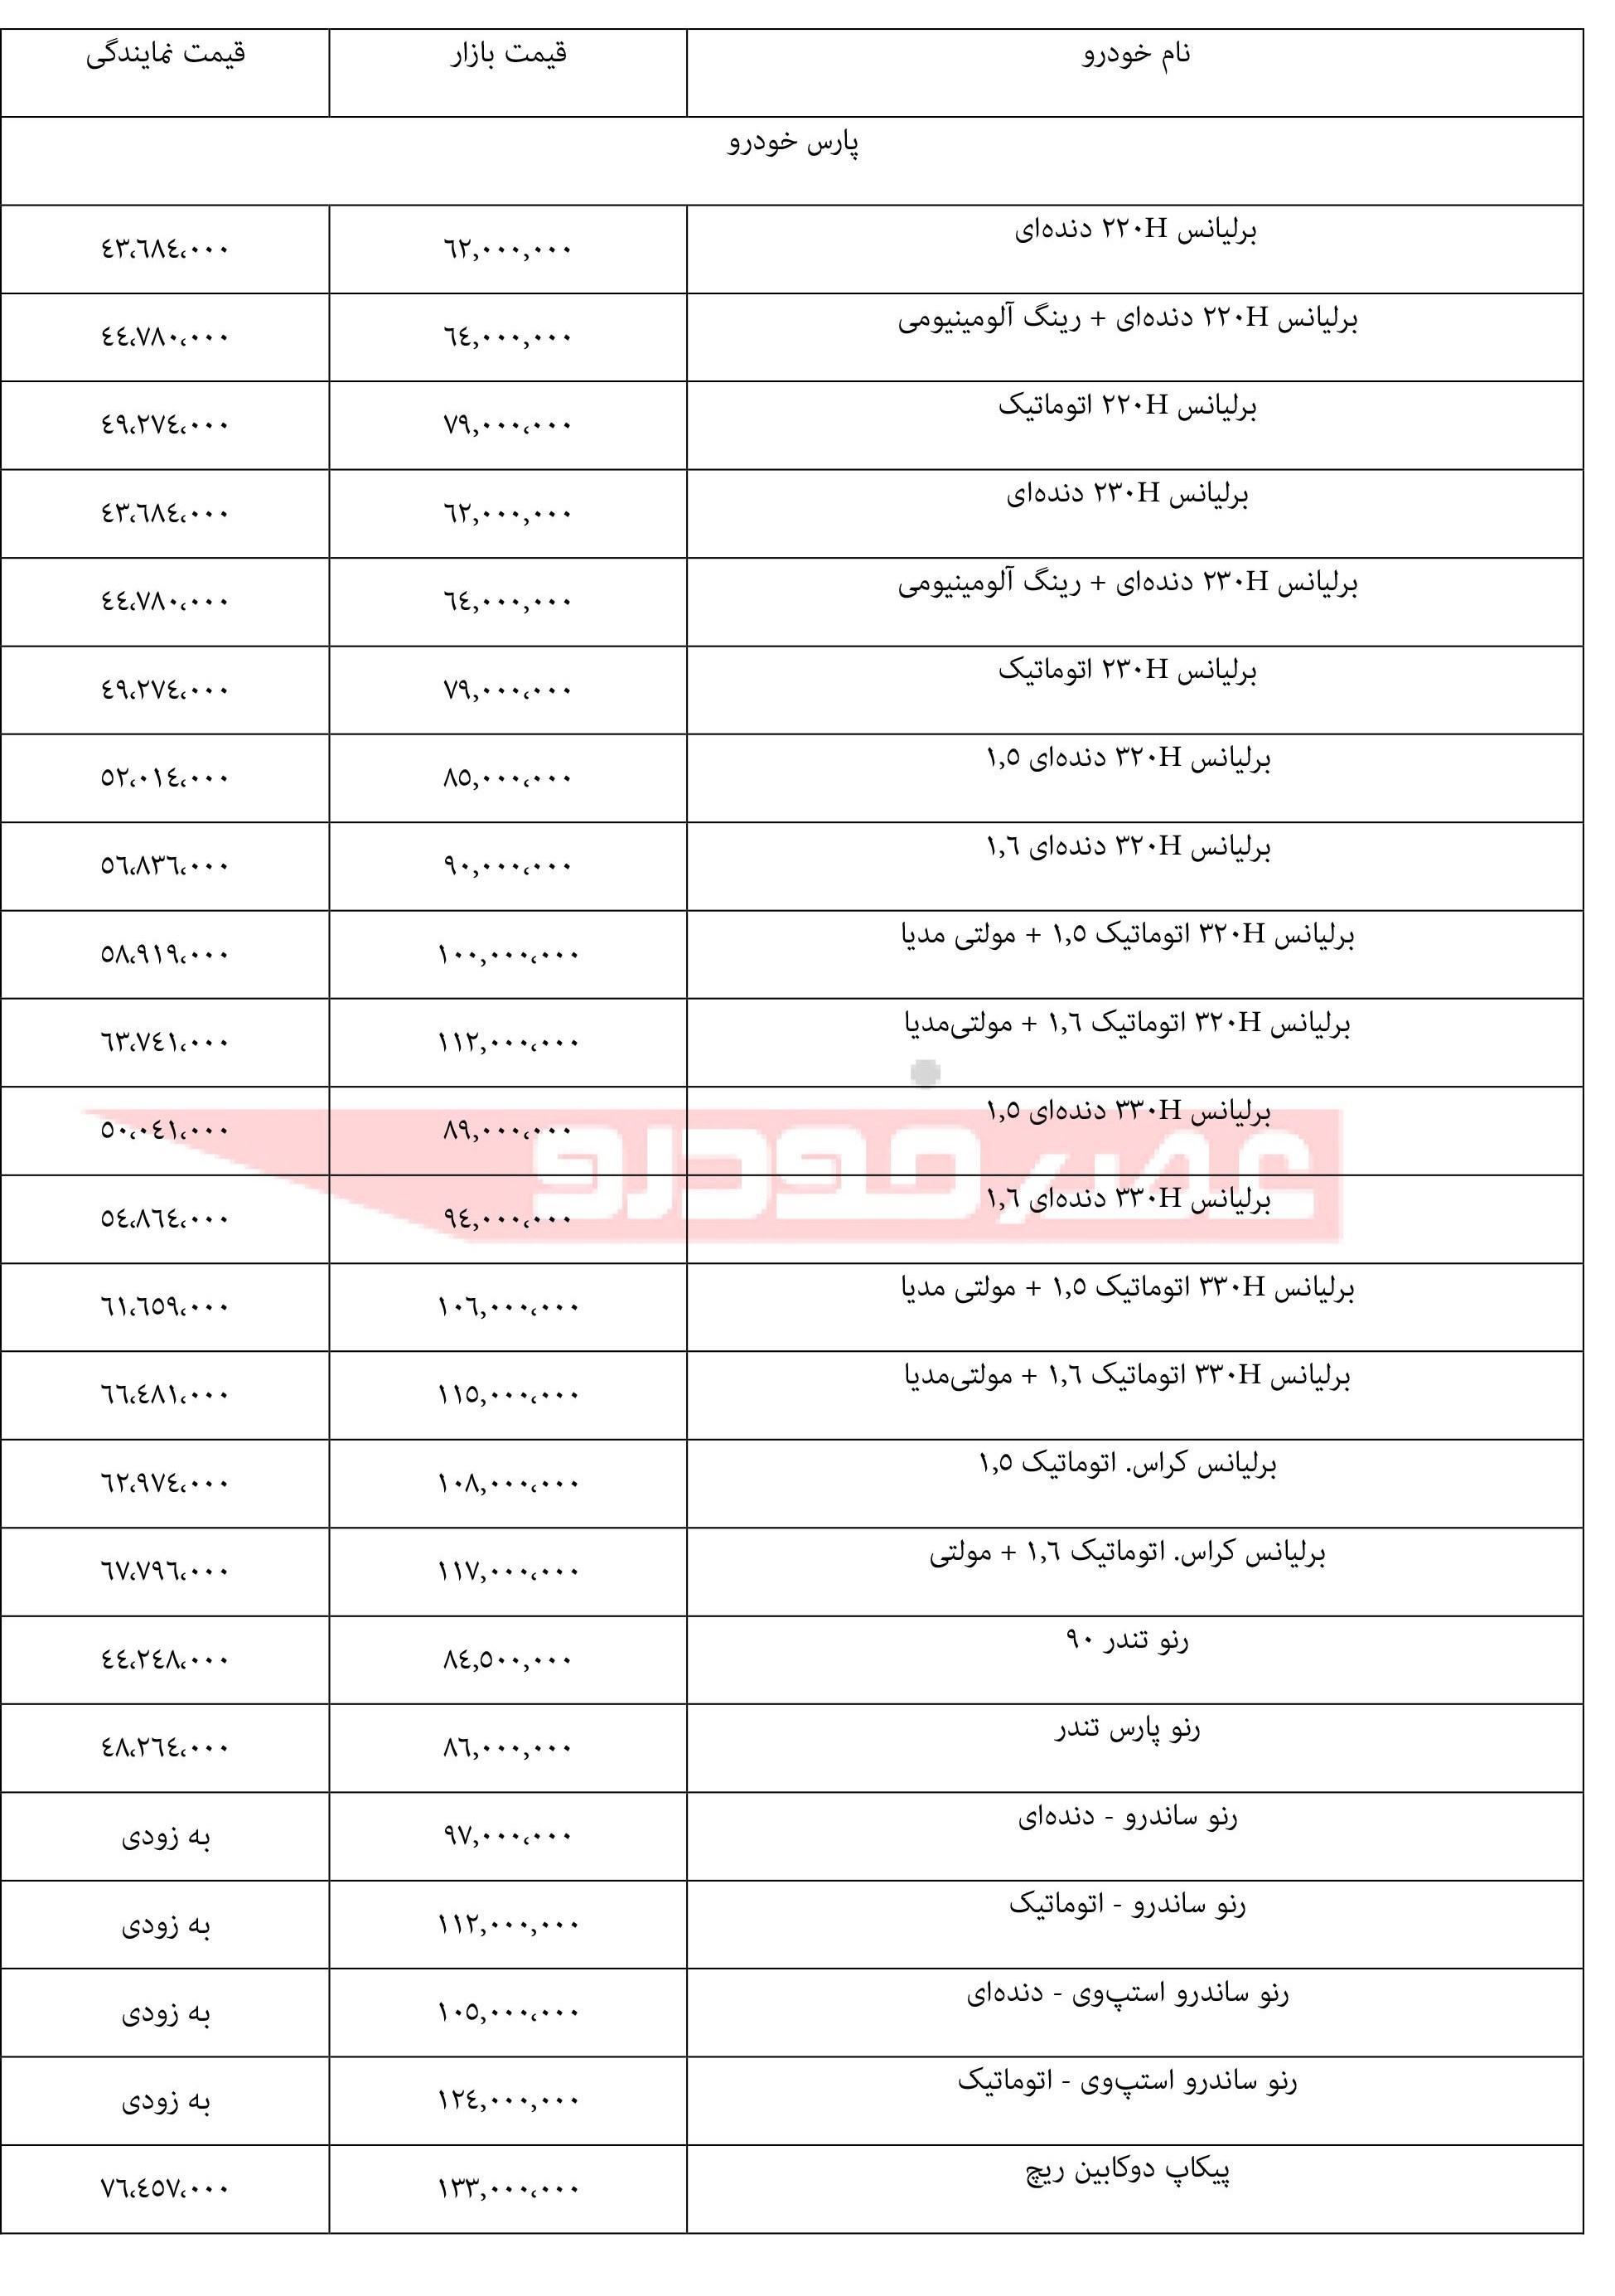 قیمت محصولات پارس خودرو ۲۱ مهر ۹۷+عکس